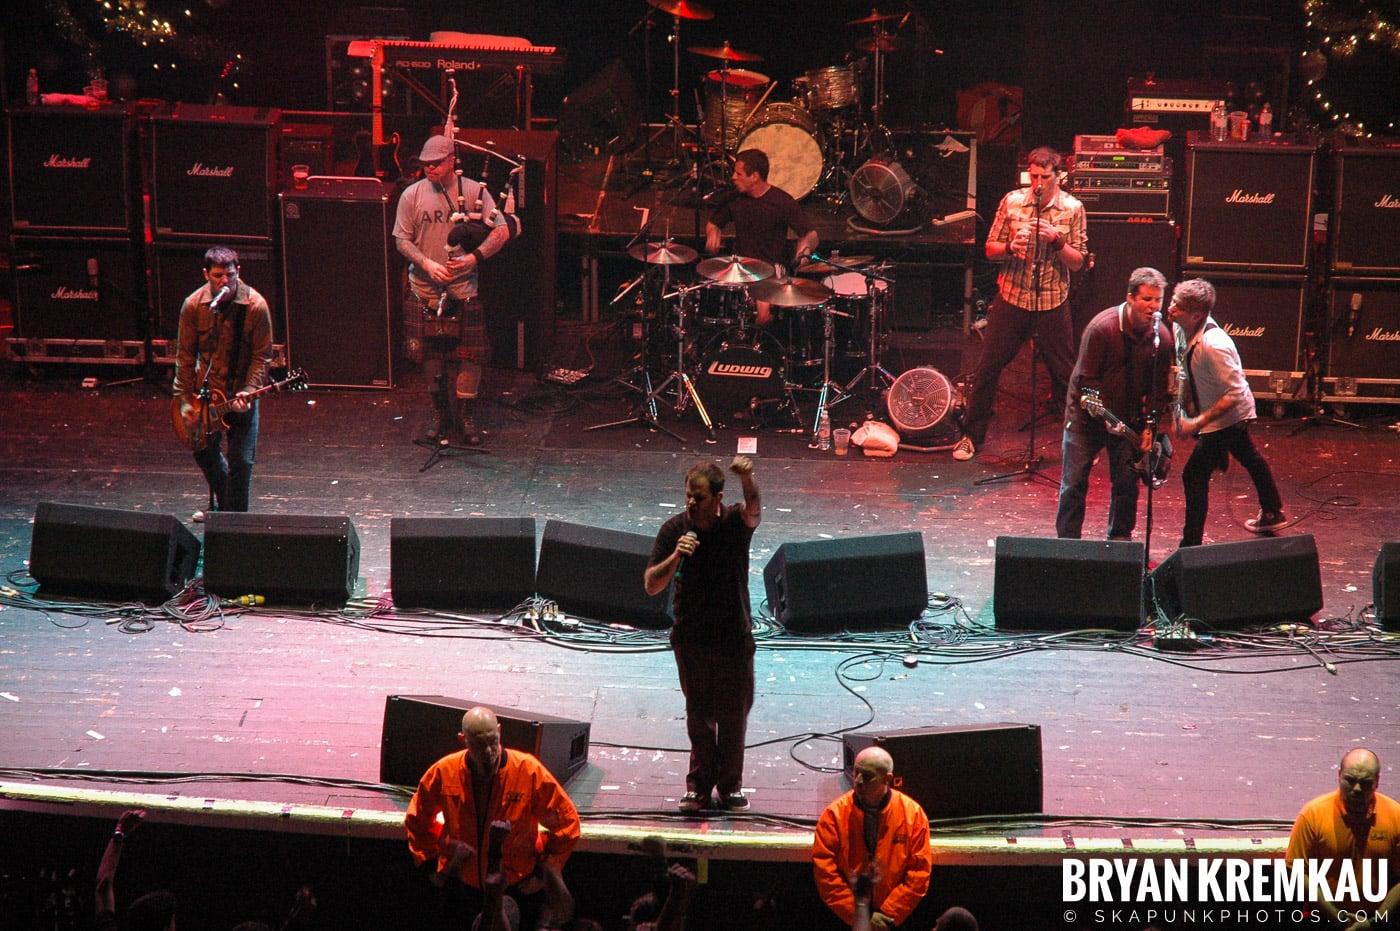 Dropkick Murphys @ Brixton Academy, London UK - 12.19.05 (4)